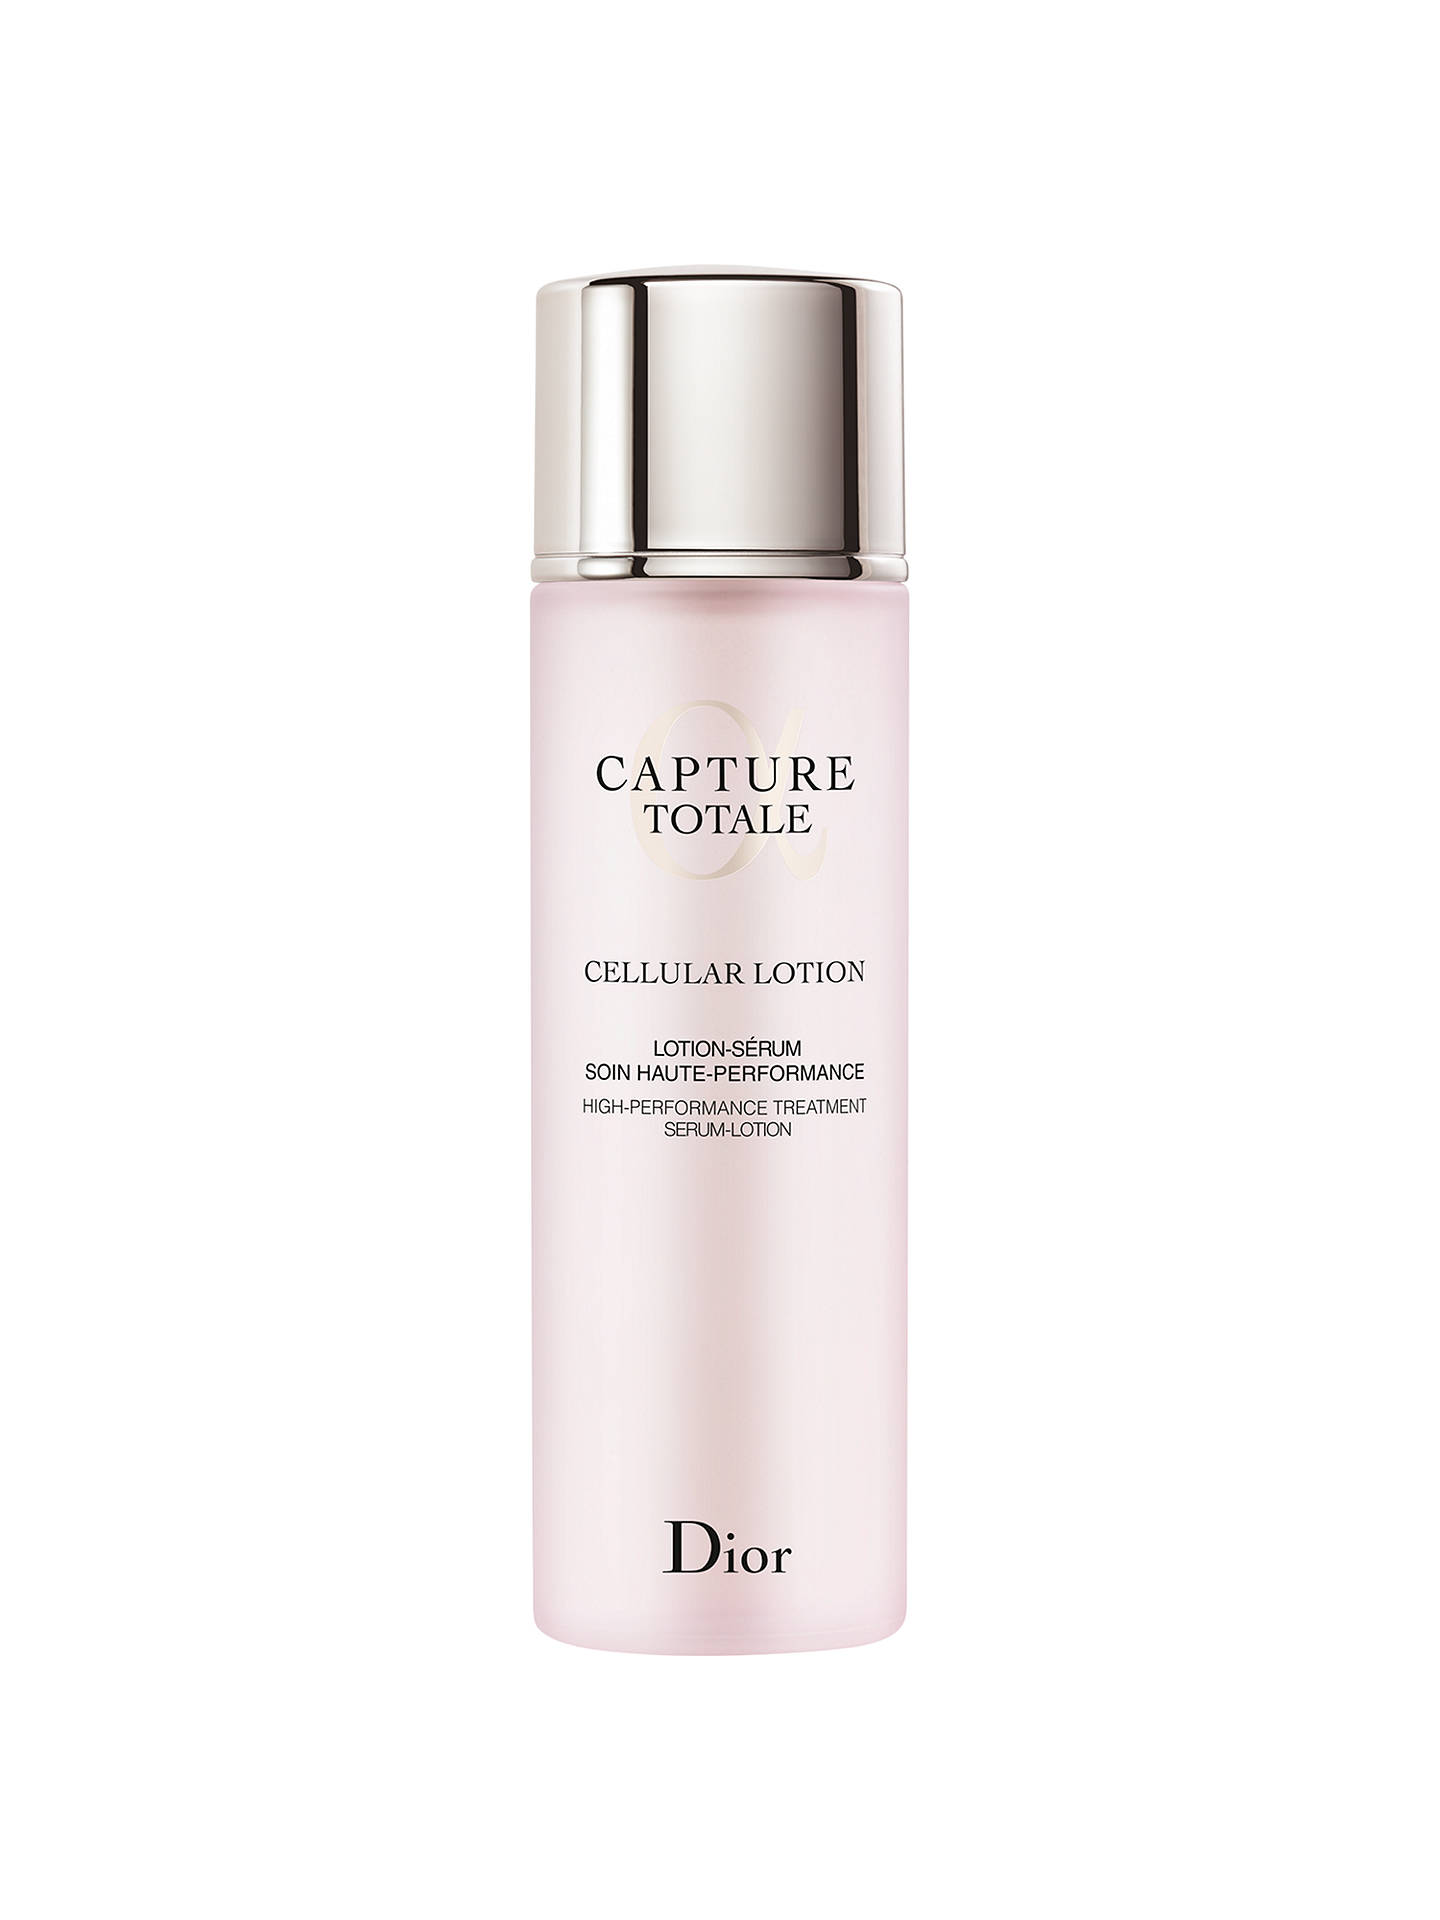 496c56c9 Dior Capture Totale Cellular Lotion, 150ml